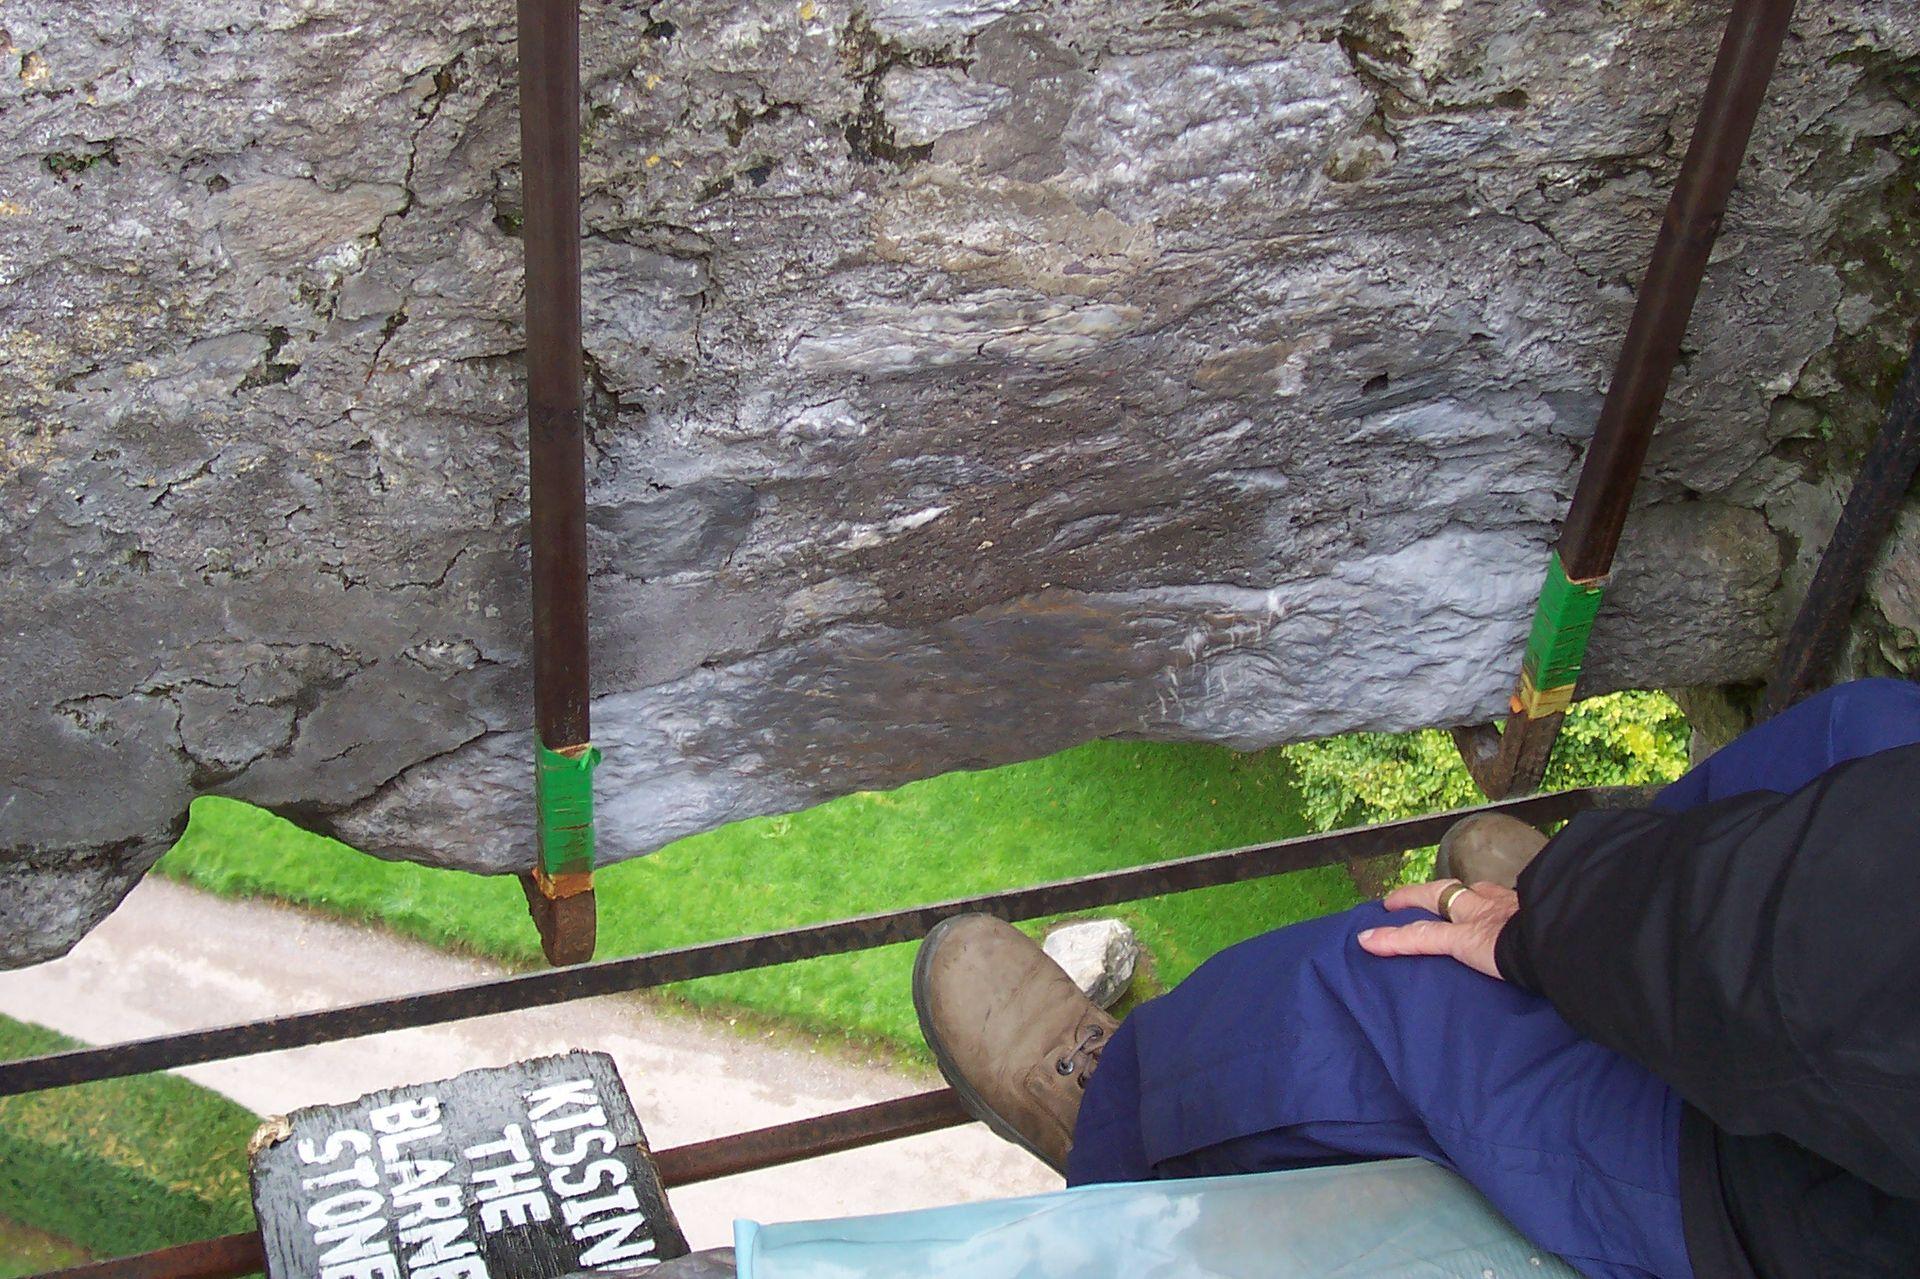 Blarney stone wikipedia for The blarney